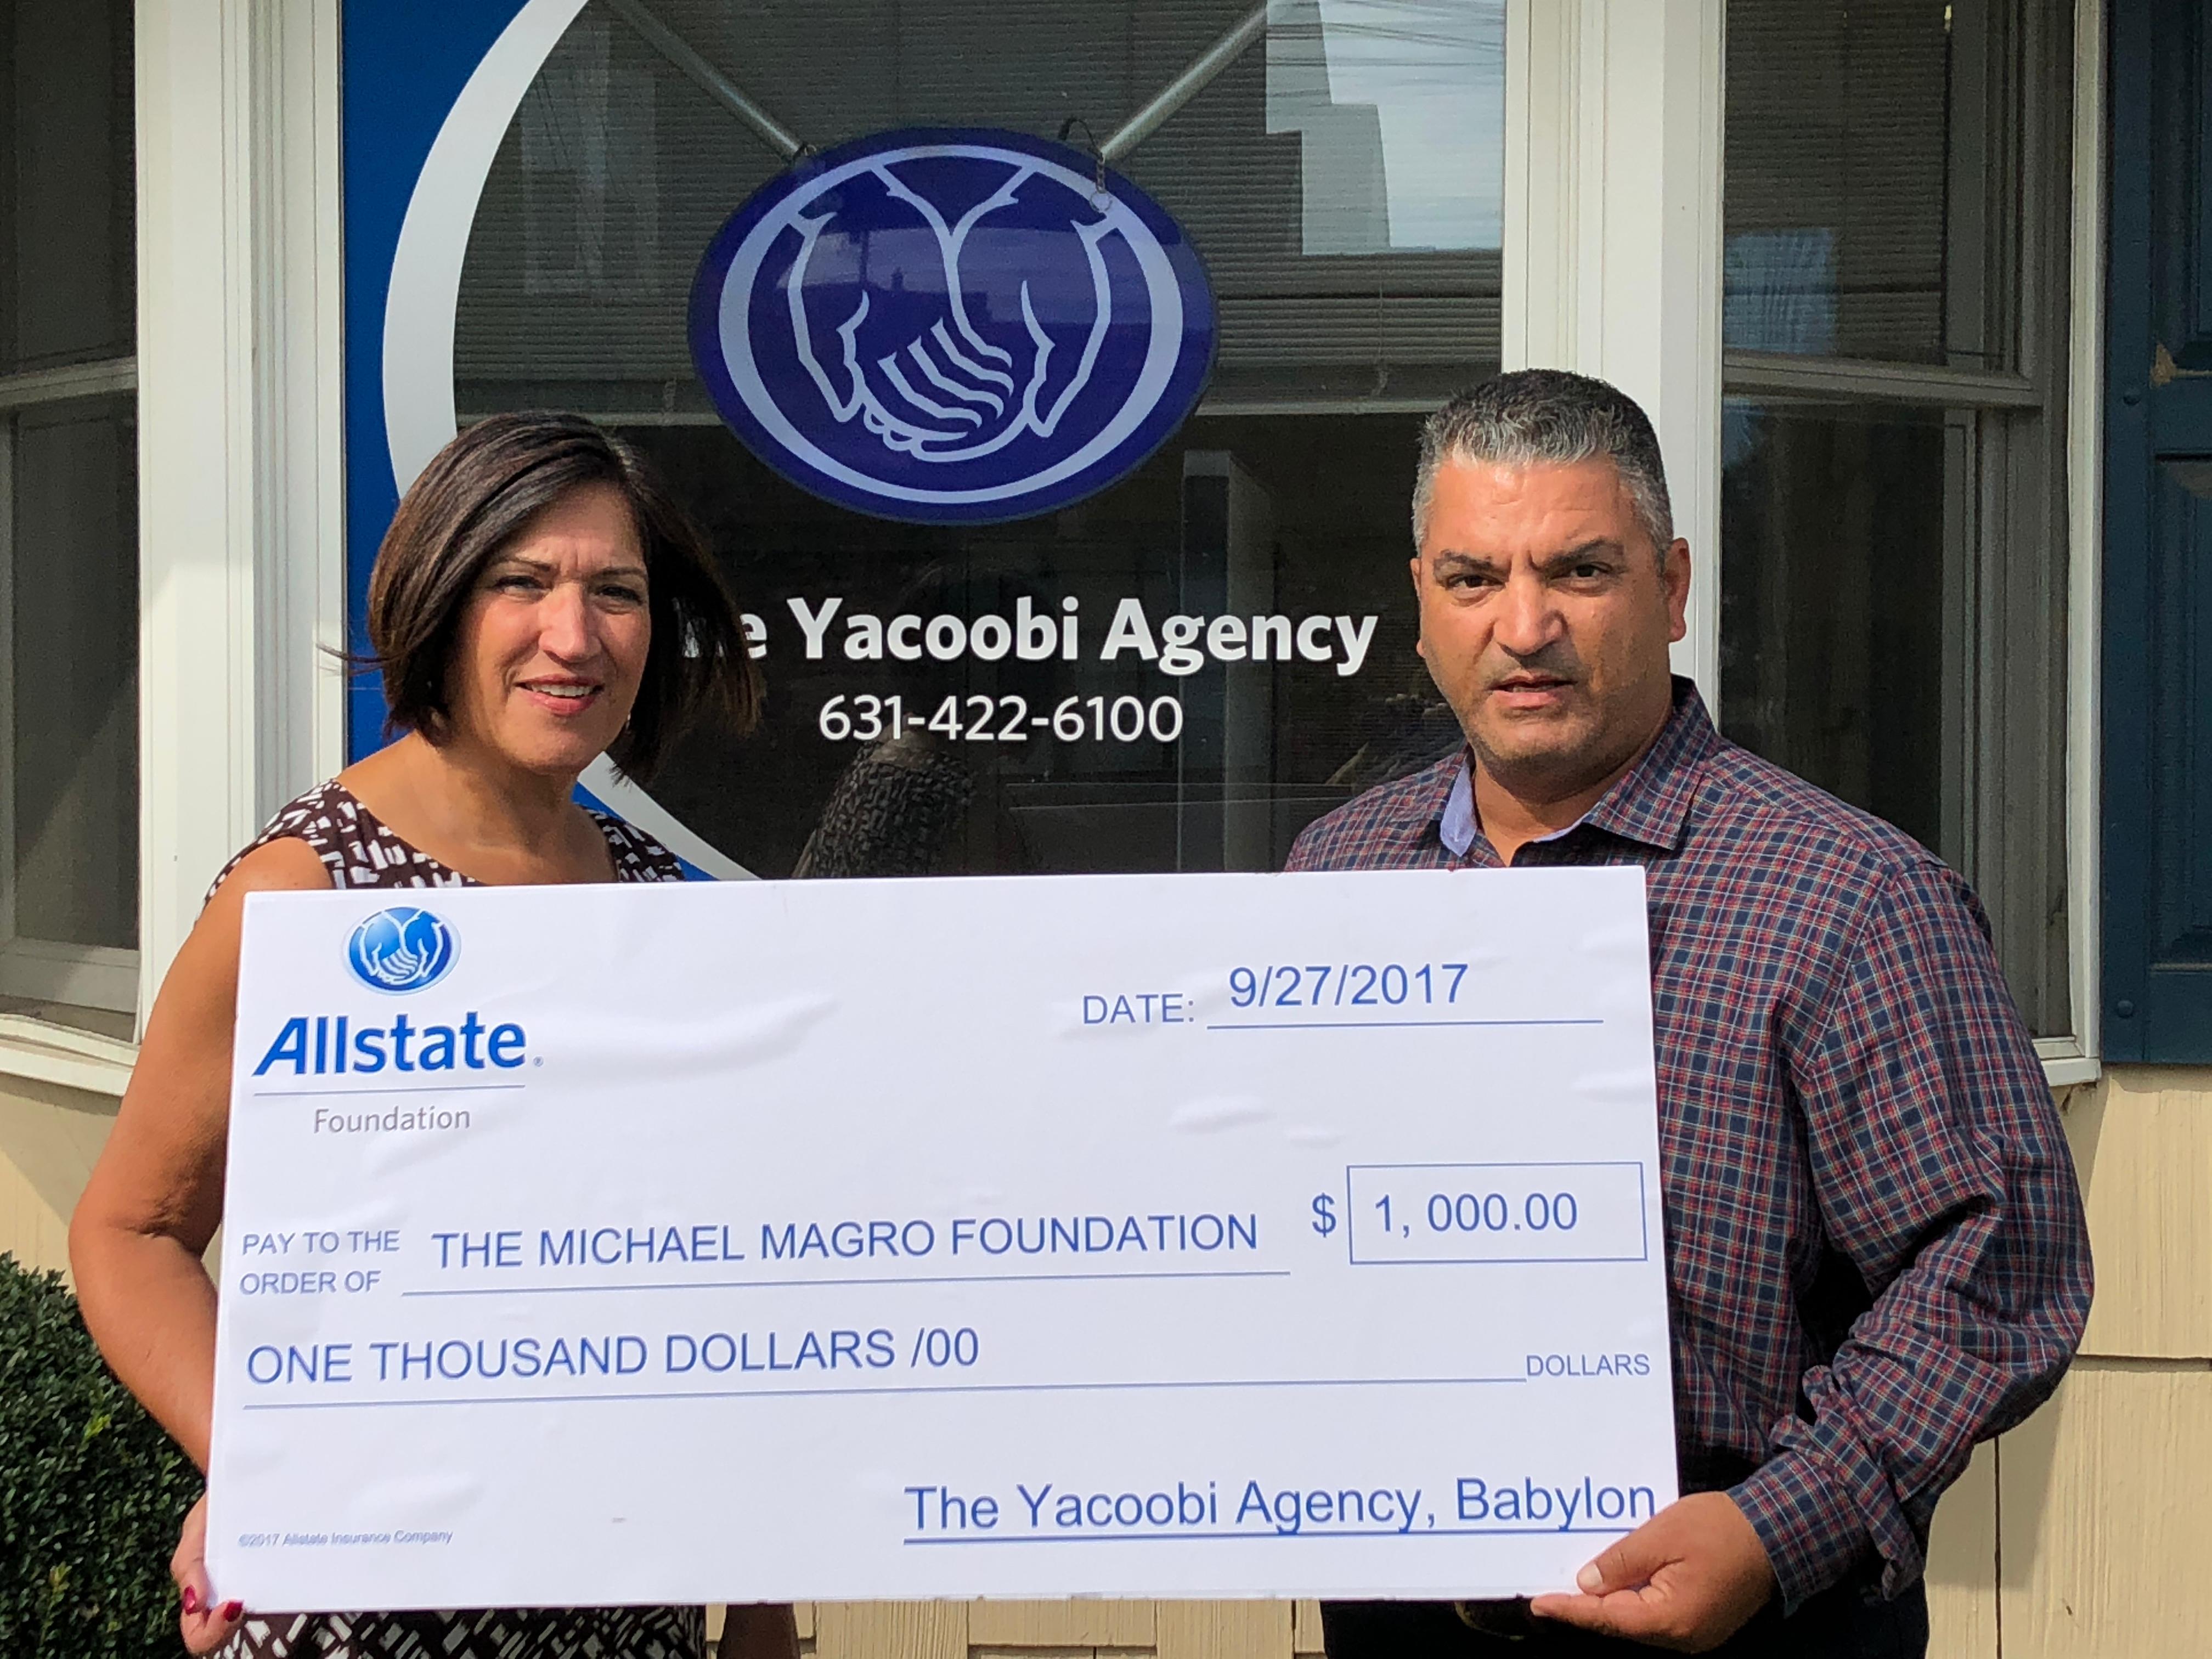 Zubin Yacoobi: Allstate Insurance image 6